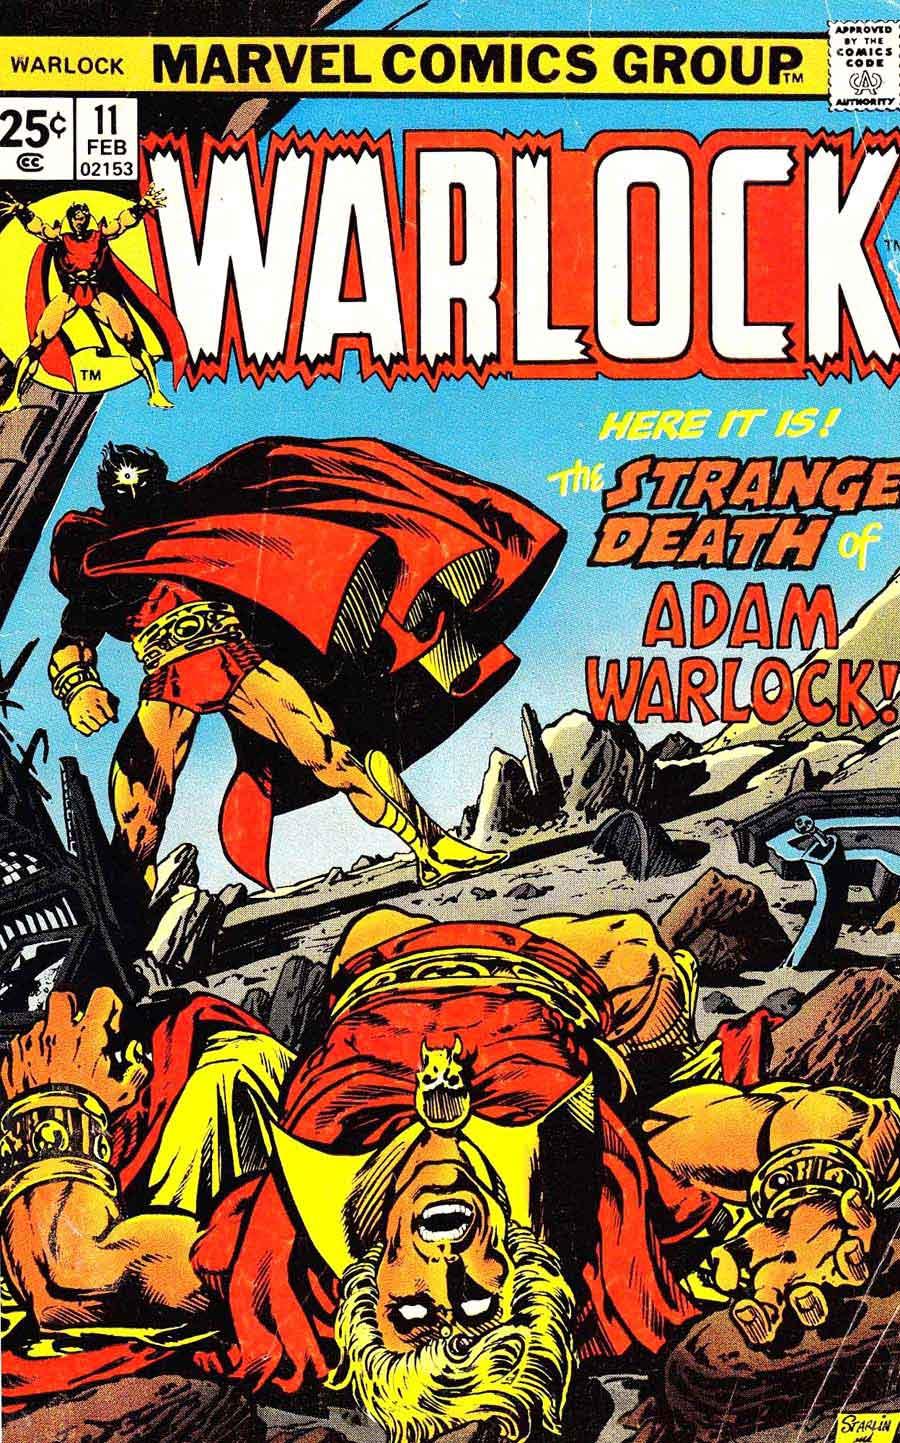 Warlock v1 #11 marvel 1970s bronze age comic book cover art by Jim Starlin